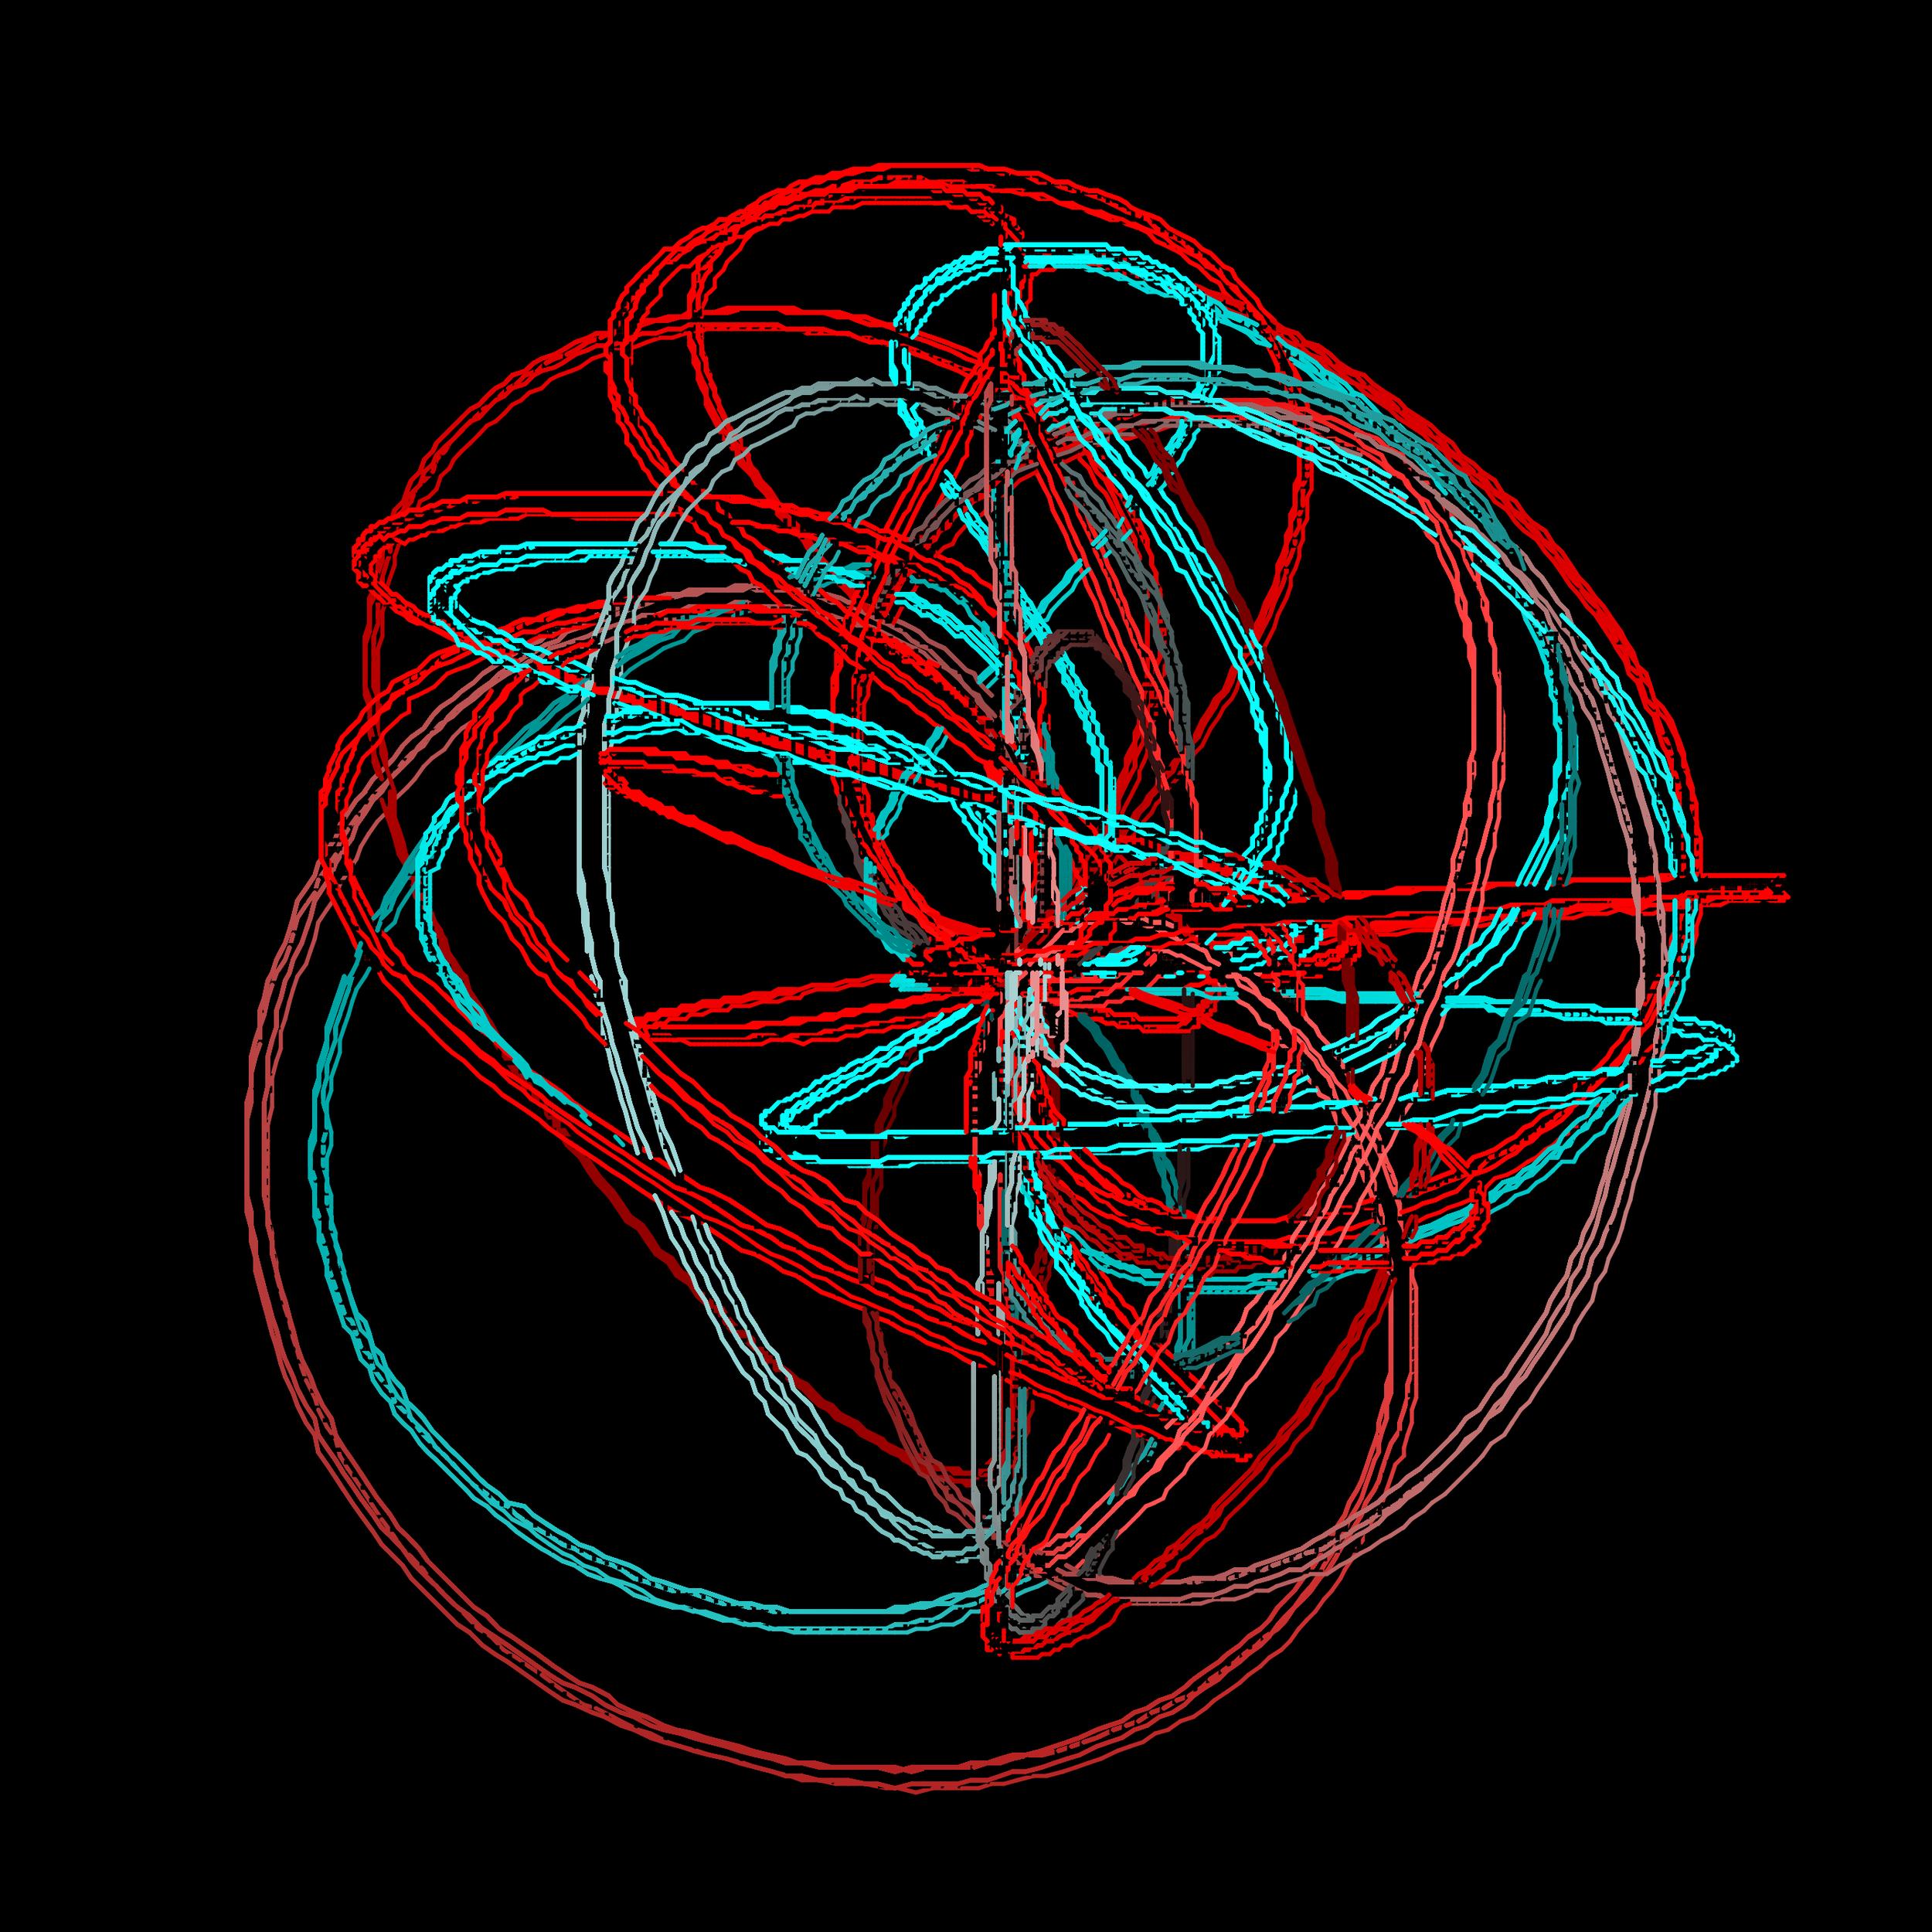 20d2dbc4-5aa3-4ac4-9976-c5925bce63c1.png